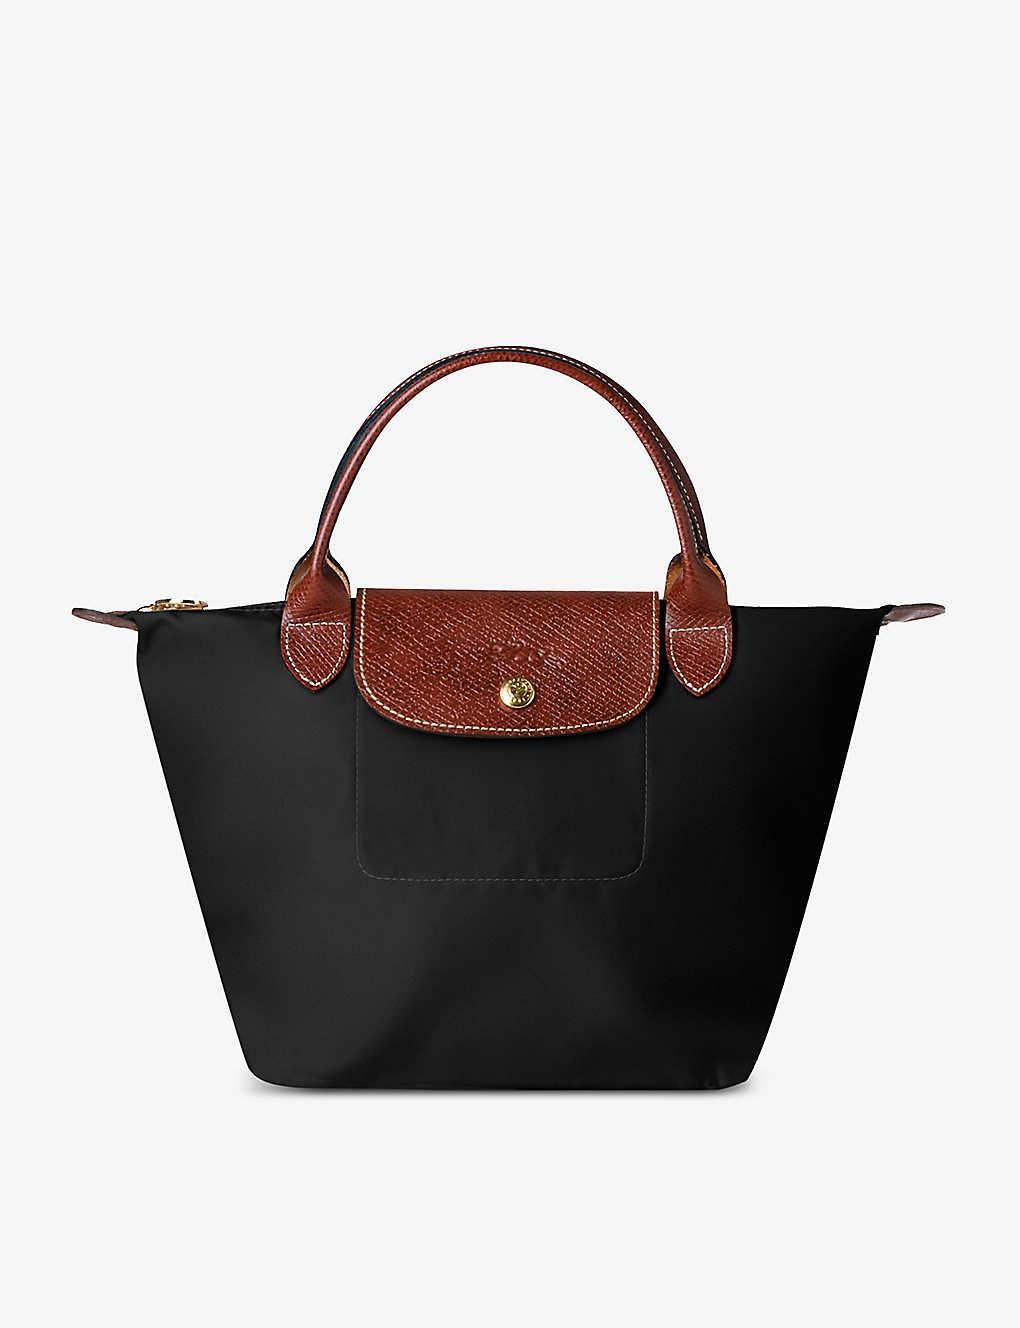 bb72be791d0a LONGCHAMP - Le Pliage small handbag